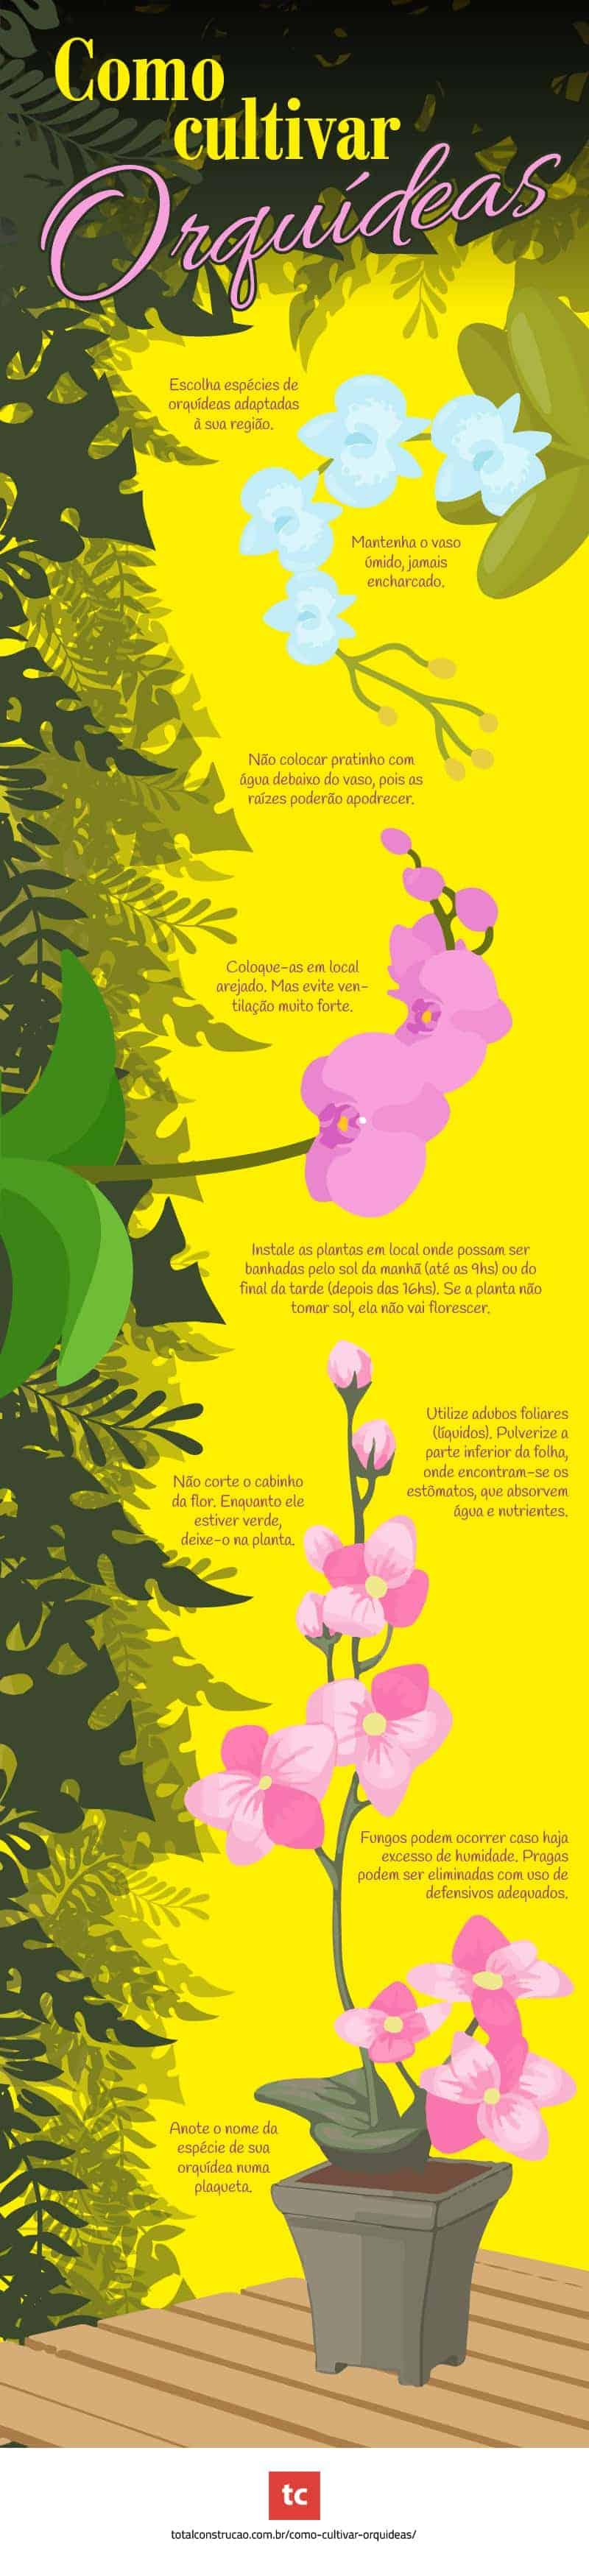 infografico de orquidea